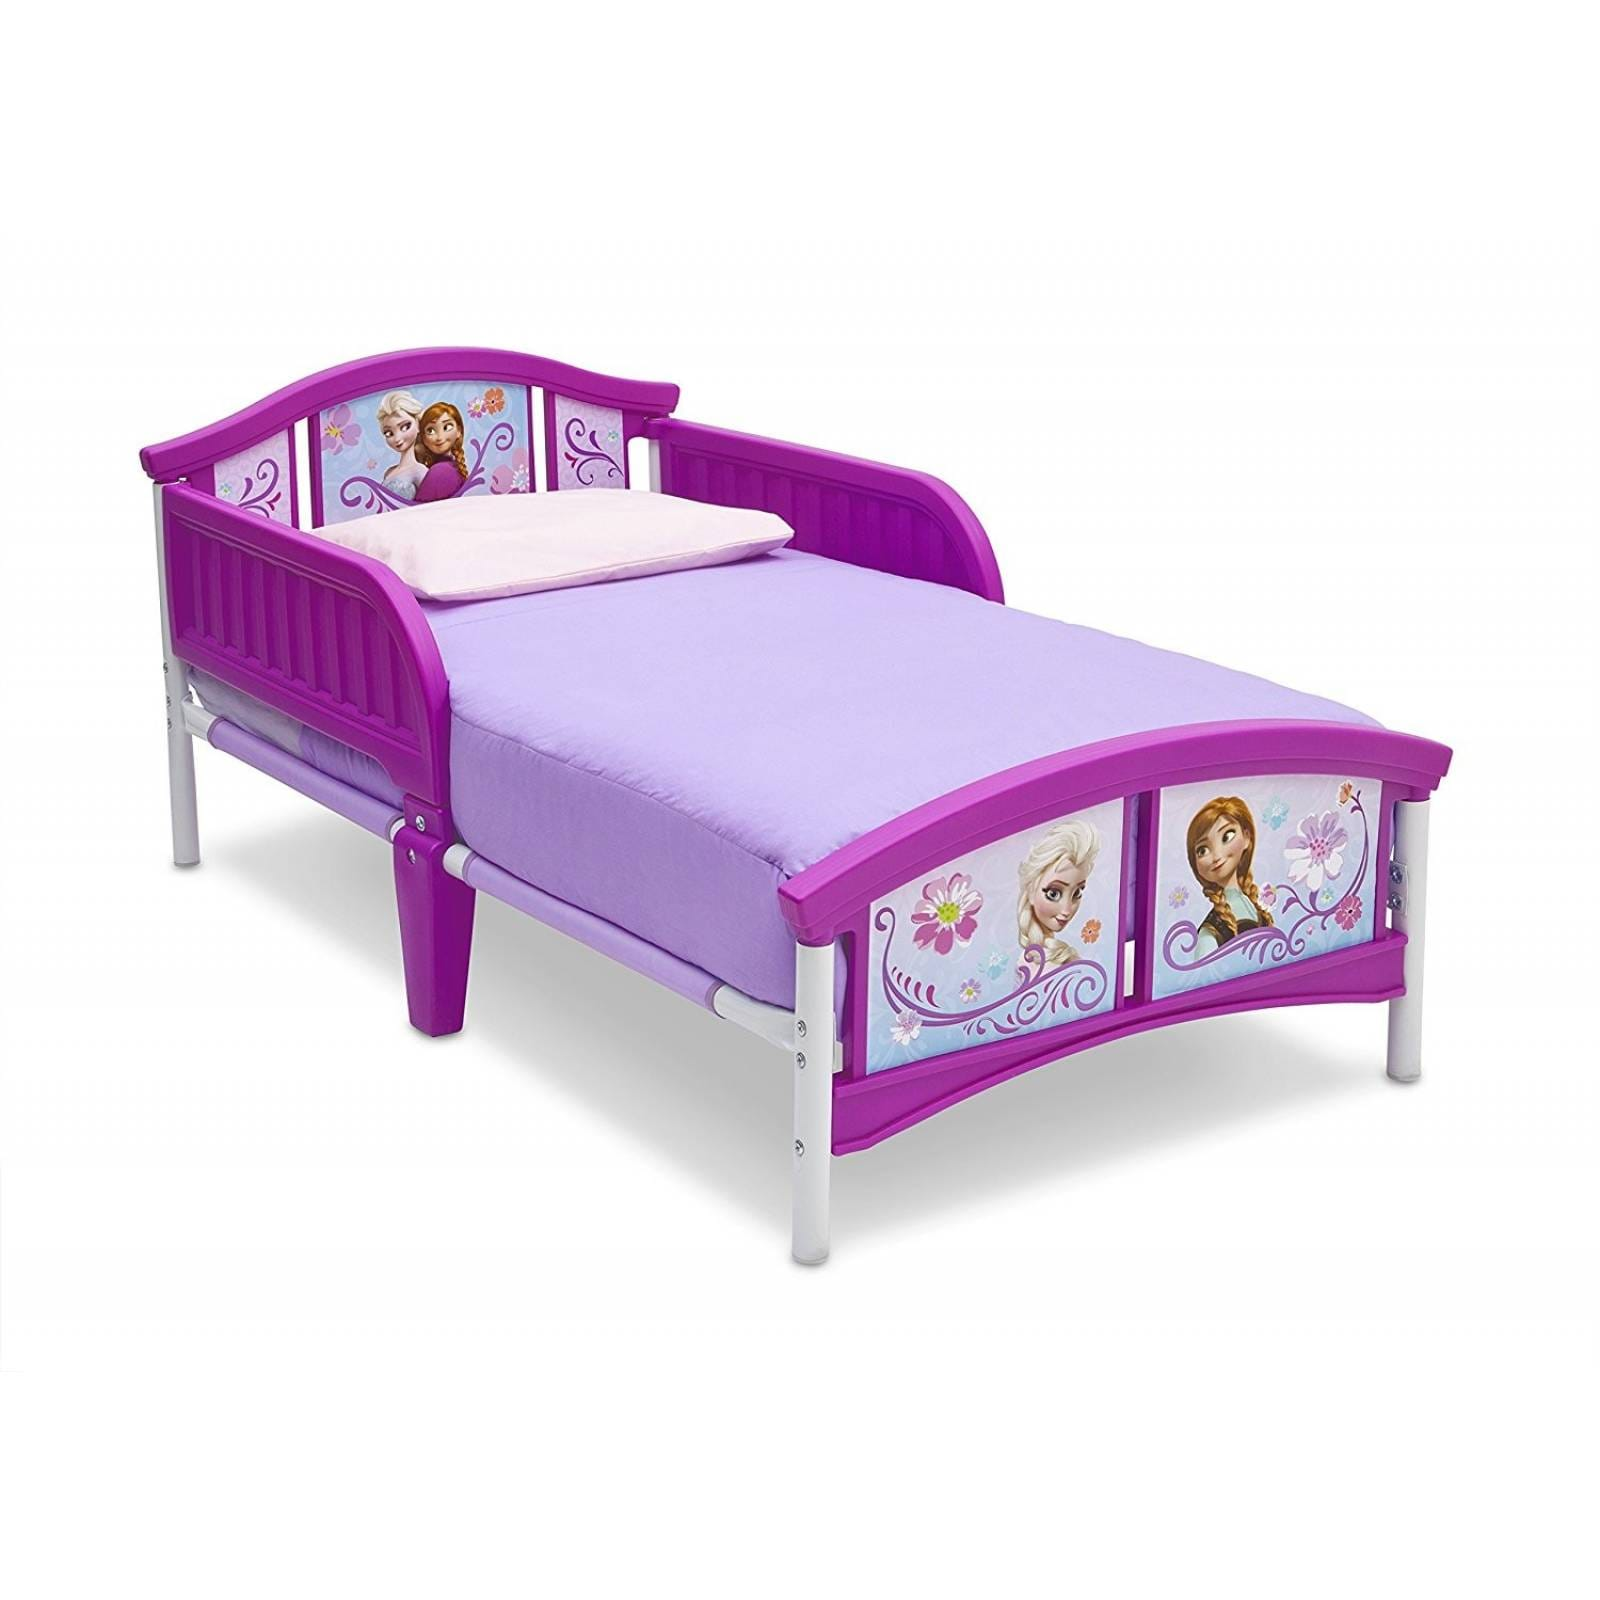 Cama Infantil Delta Children Disney Frozen Hasta 22kg -rosa